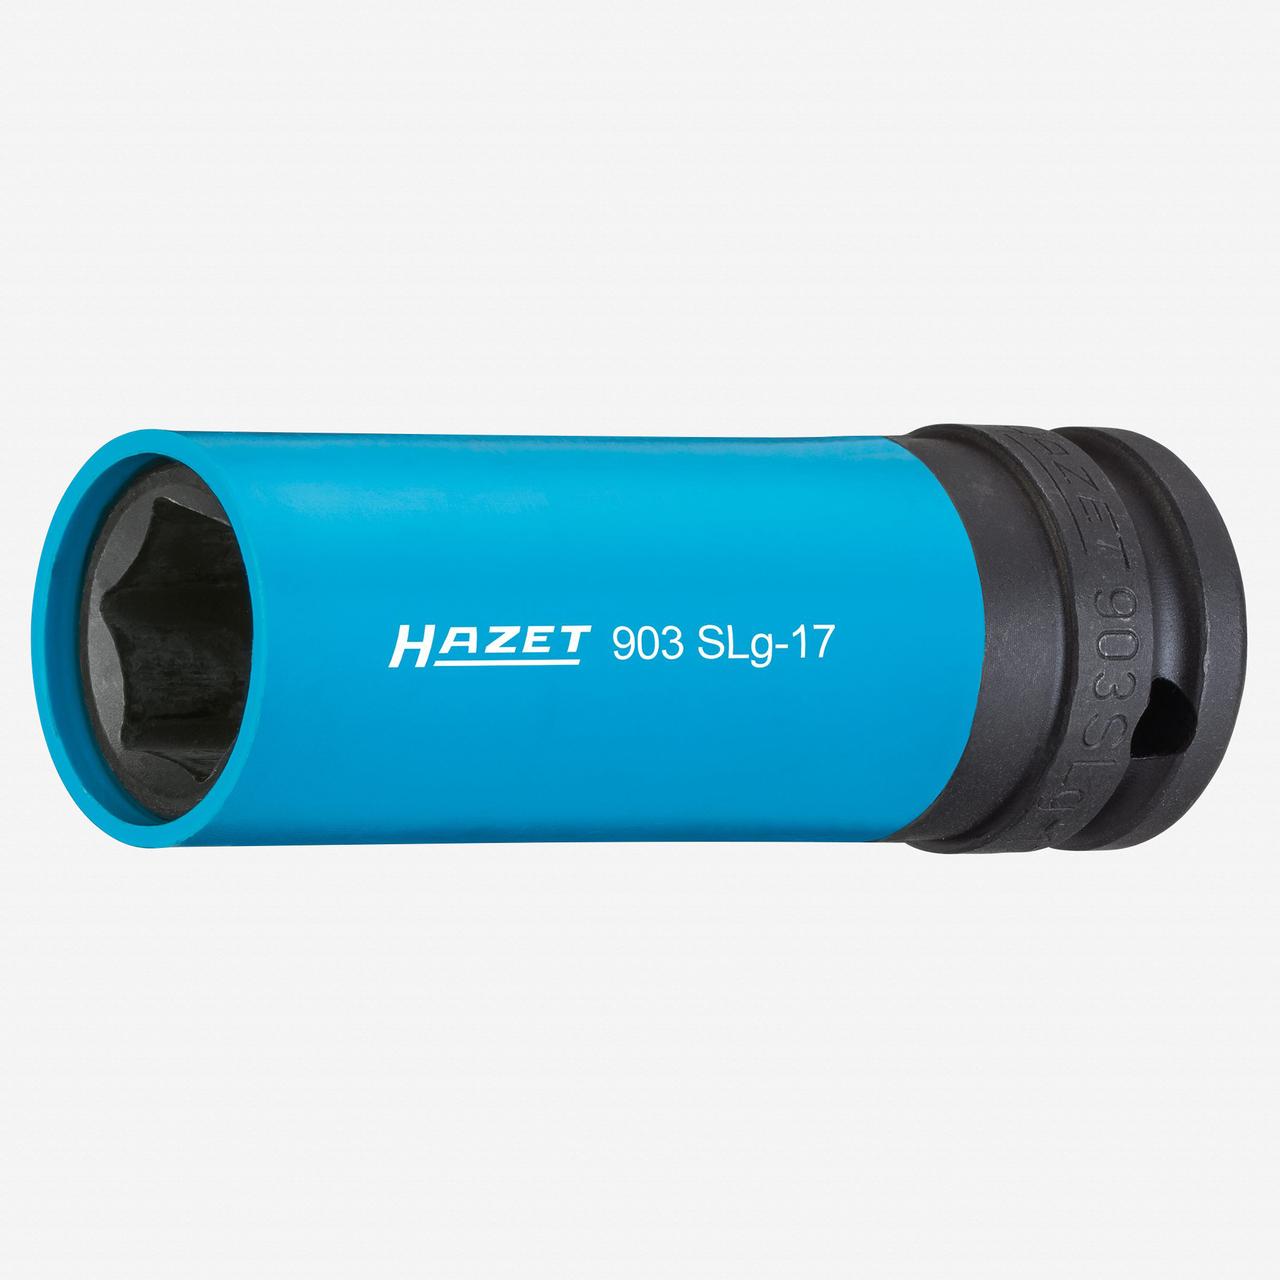 "Hazet 903SLG-17 Impact socket (6-point) 17mm x 1/2"" Lug Nut Impact Socket with Plastic Sleeve  - KC Tool"